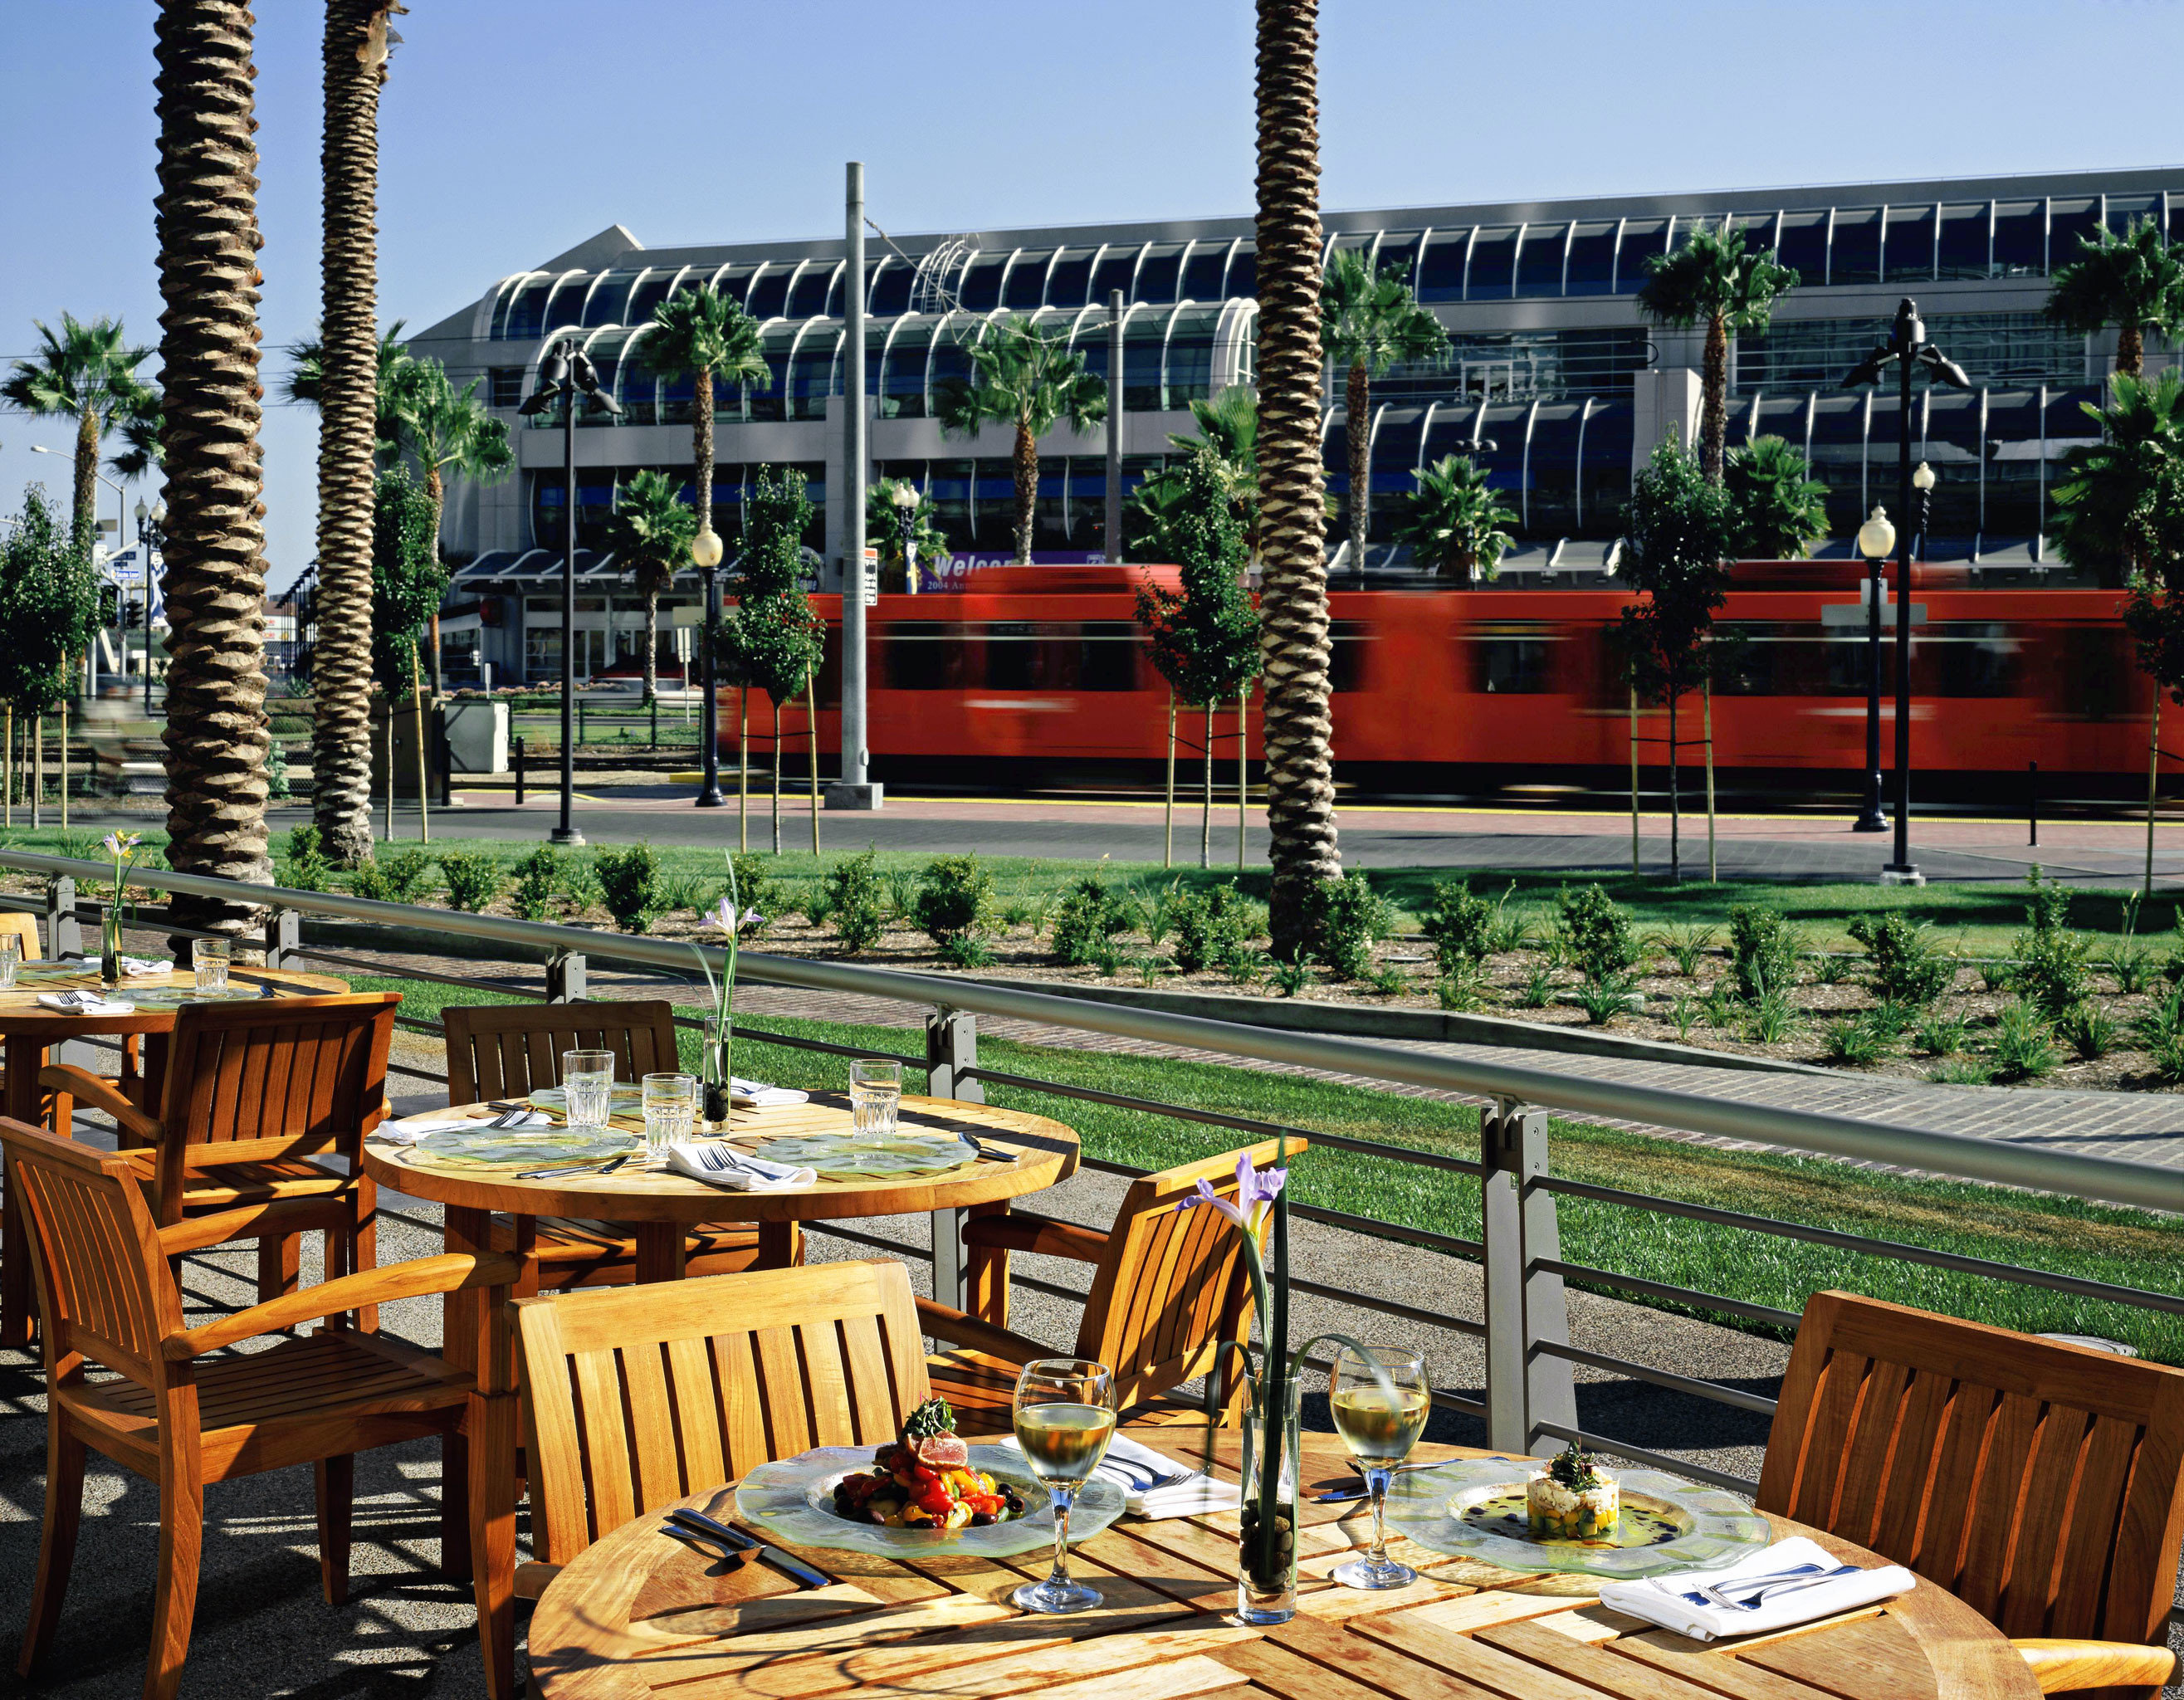 Bar Dining Drink Eat Lounge Luxury chair restaurant plaza Resort outdoor structure set